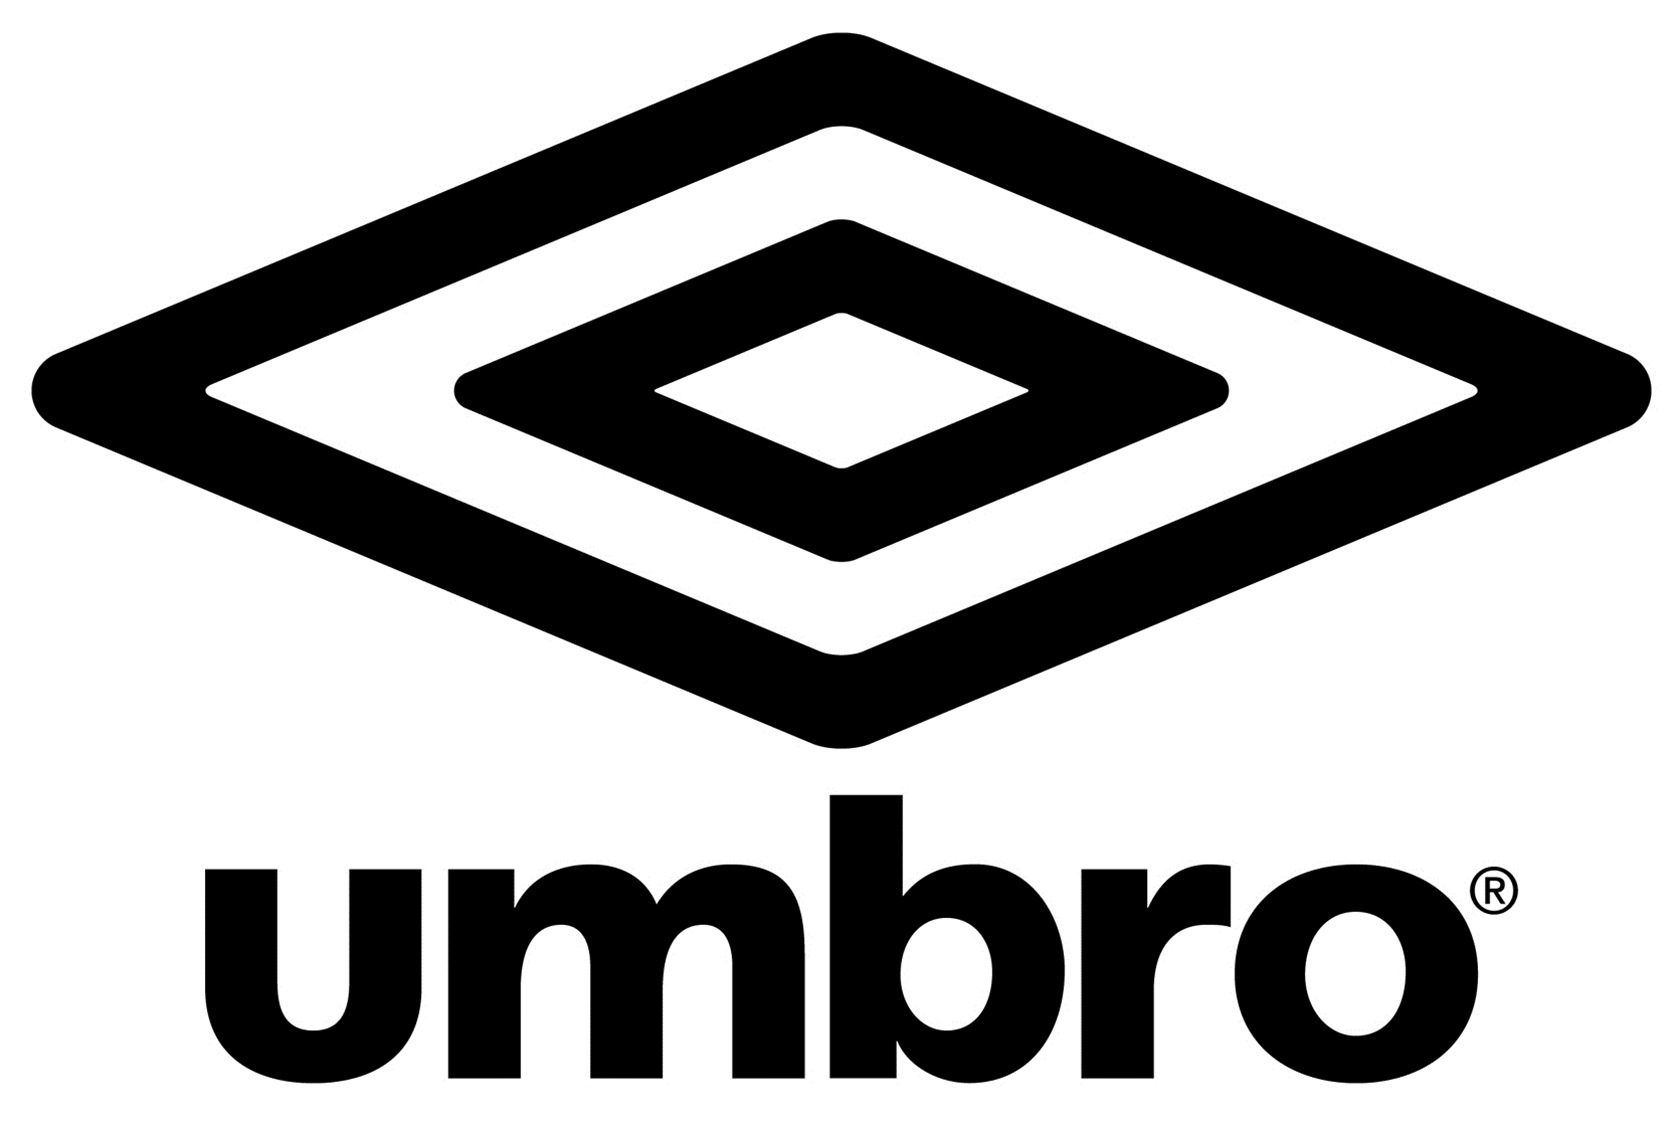 umbro logo 2 - Umbro Logo